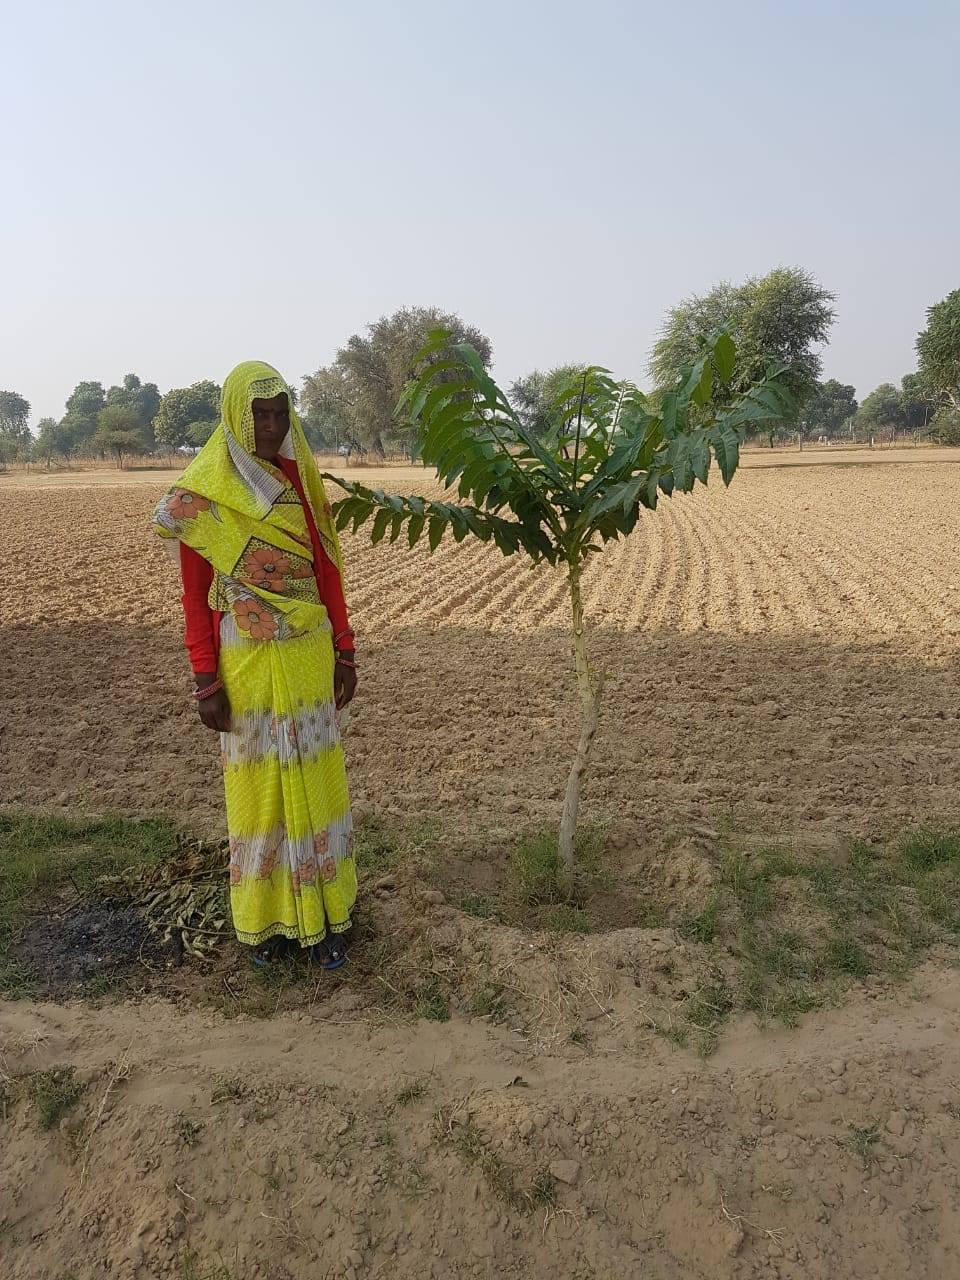 Ardu tree on farmer's plot of land